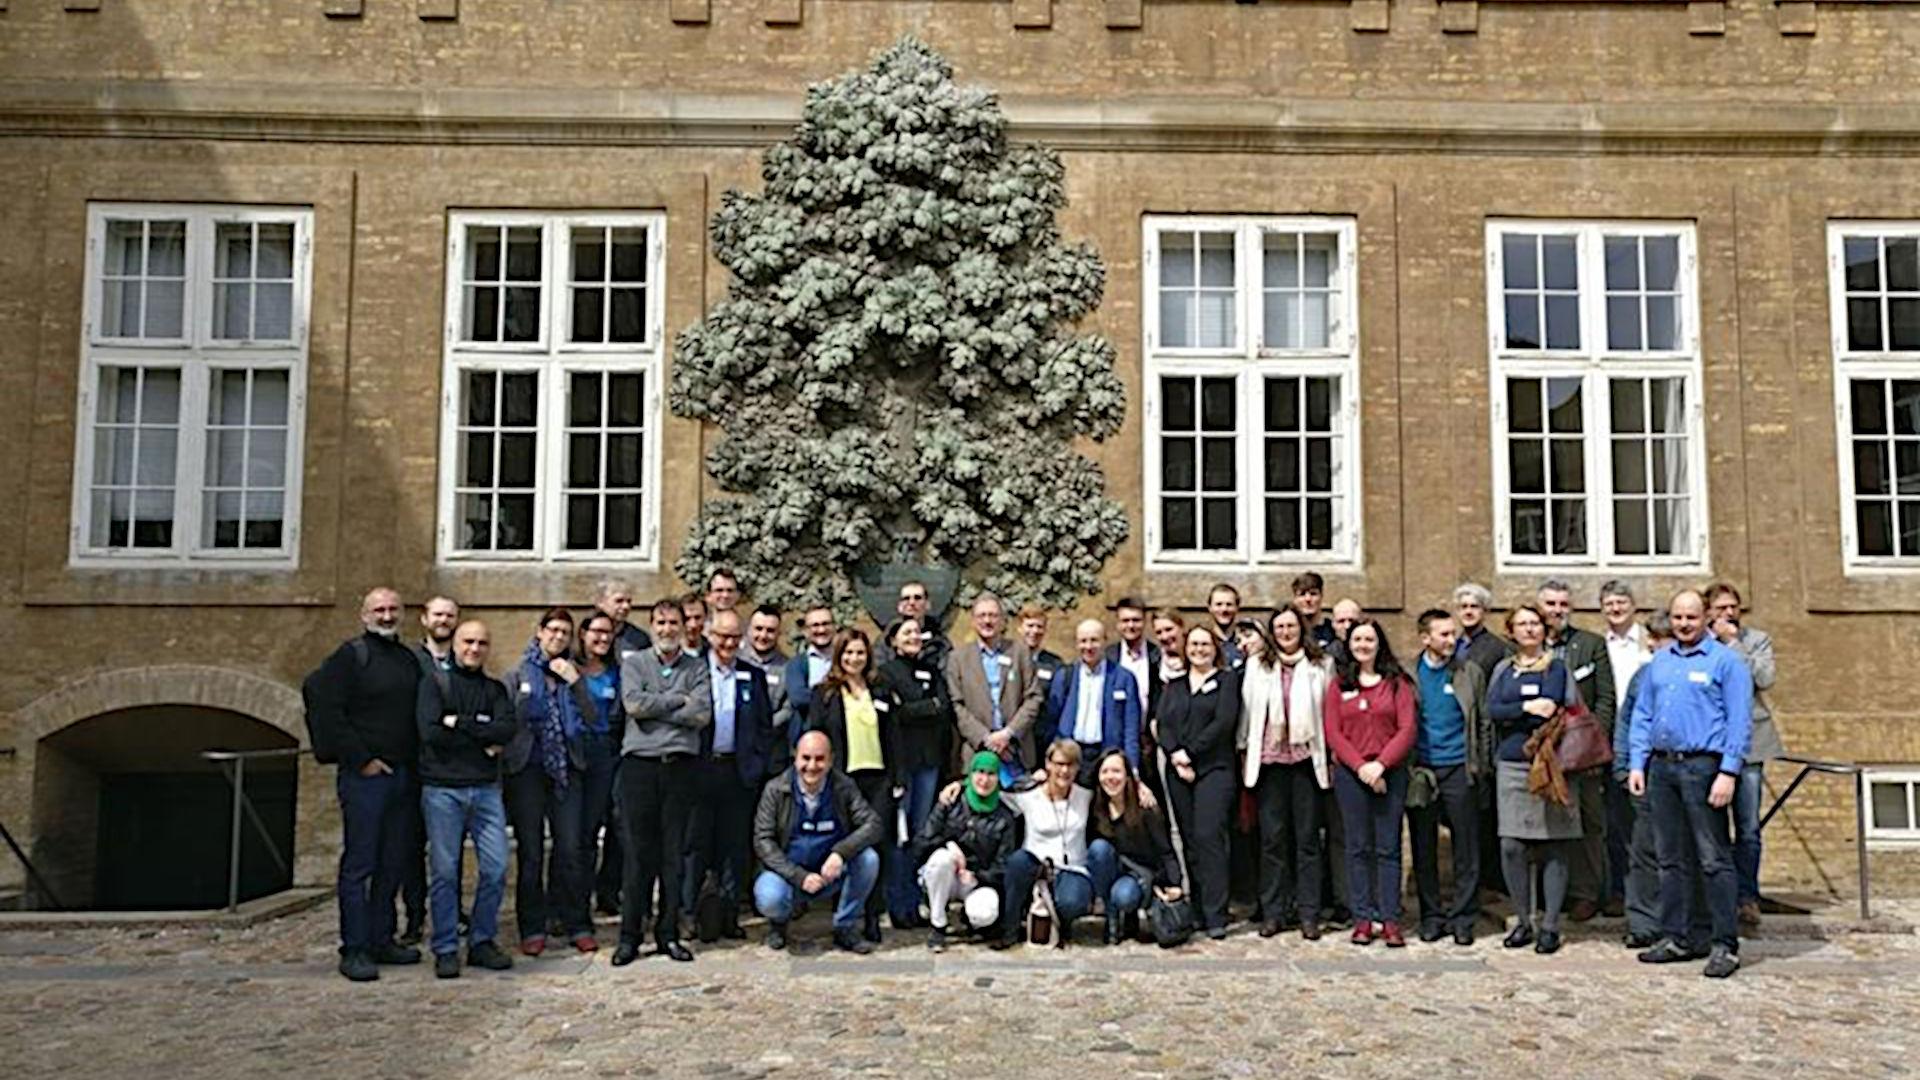 Gruppenbild der Teilnehmer am ECFN/Nomisma.org-Meeting in København